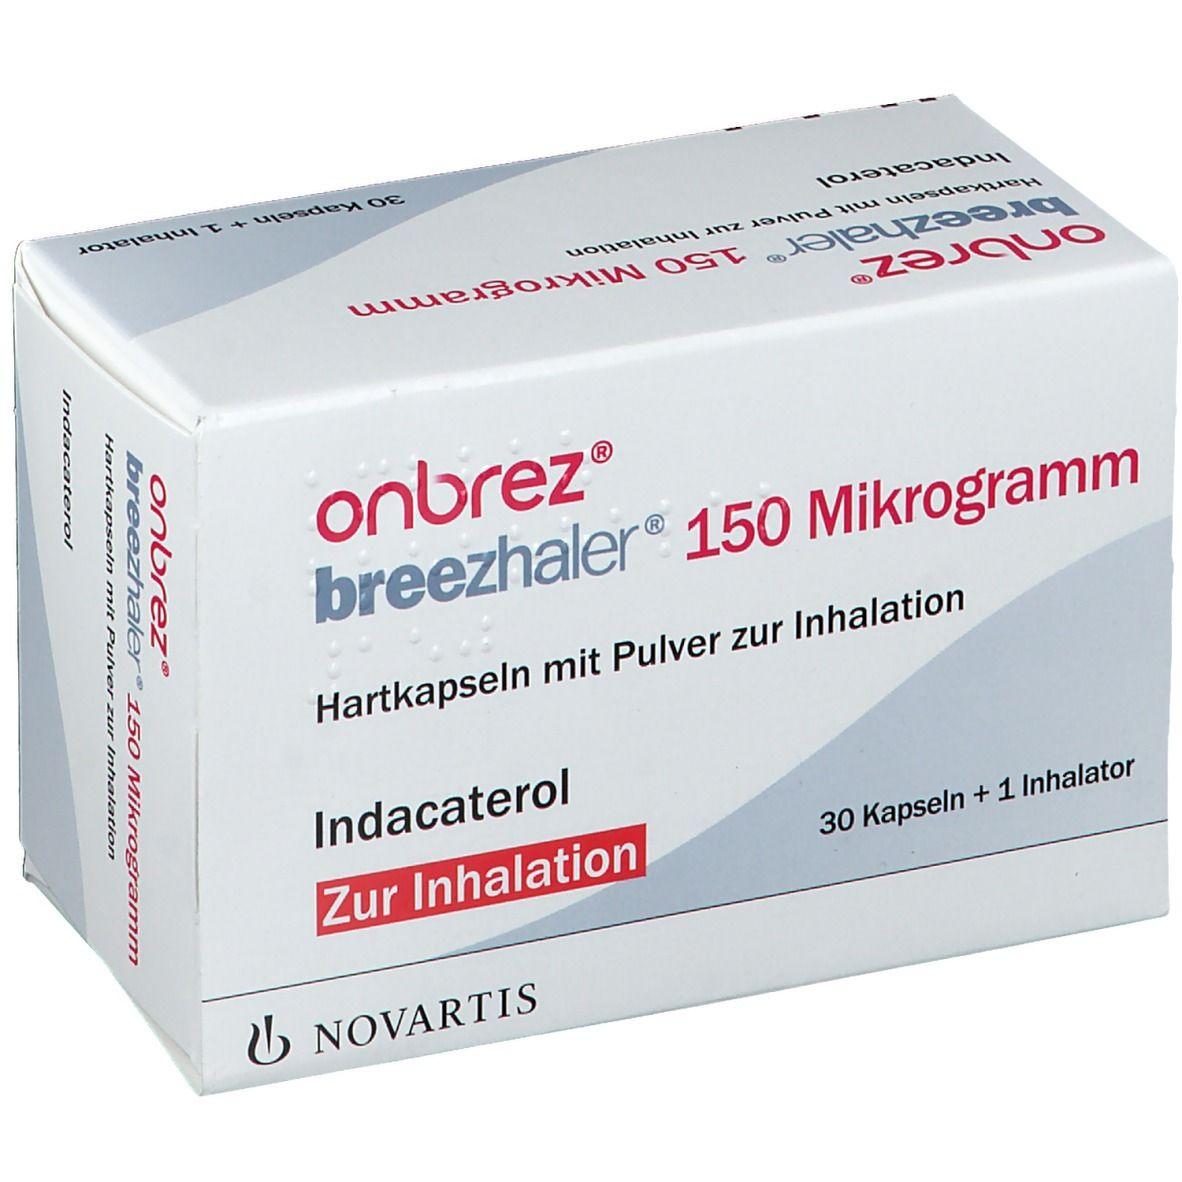 onbrez® breezhaler® 20 µg 20 St   shop apotheke.com